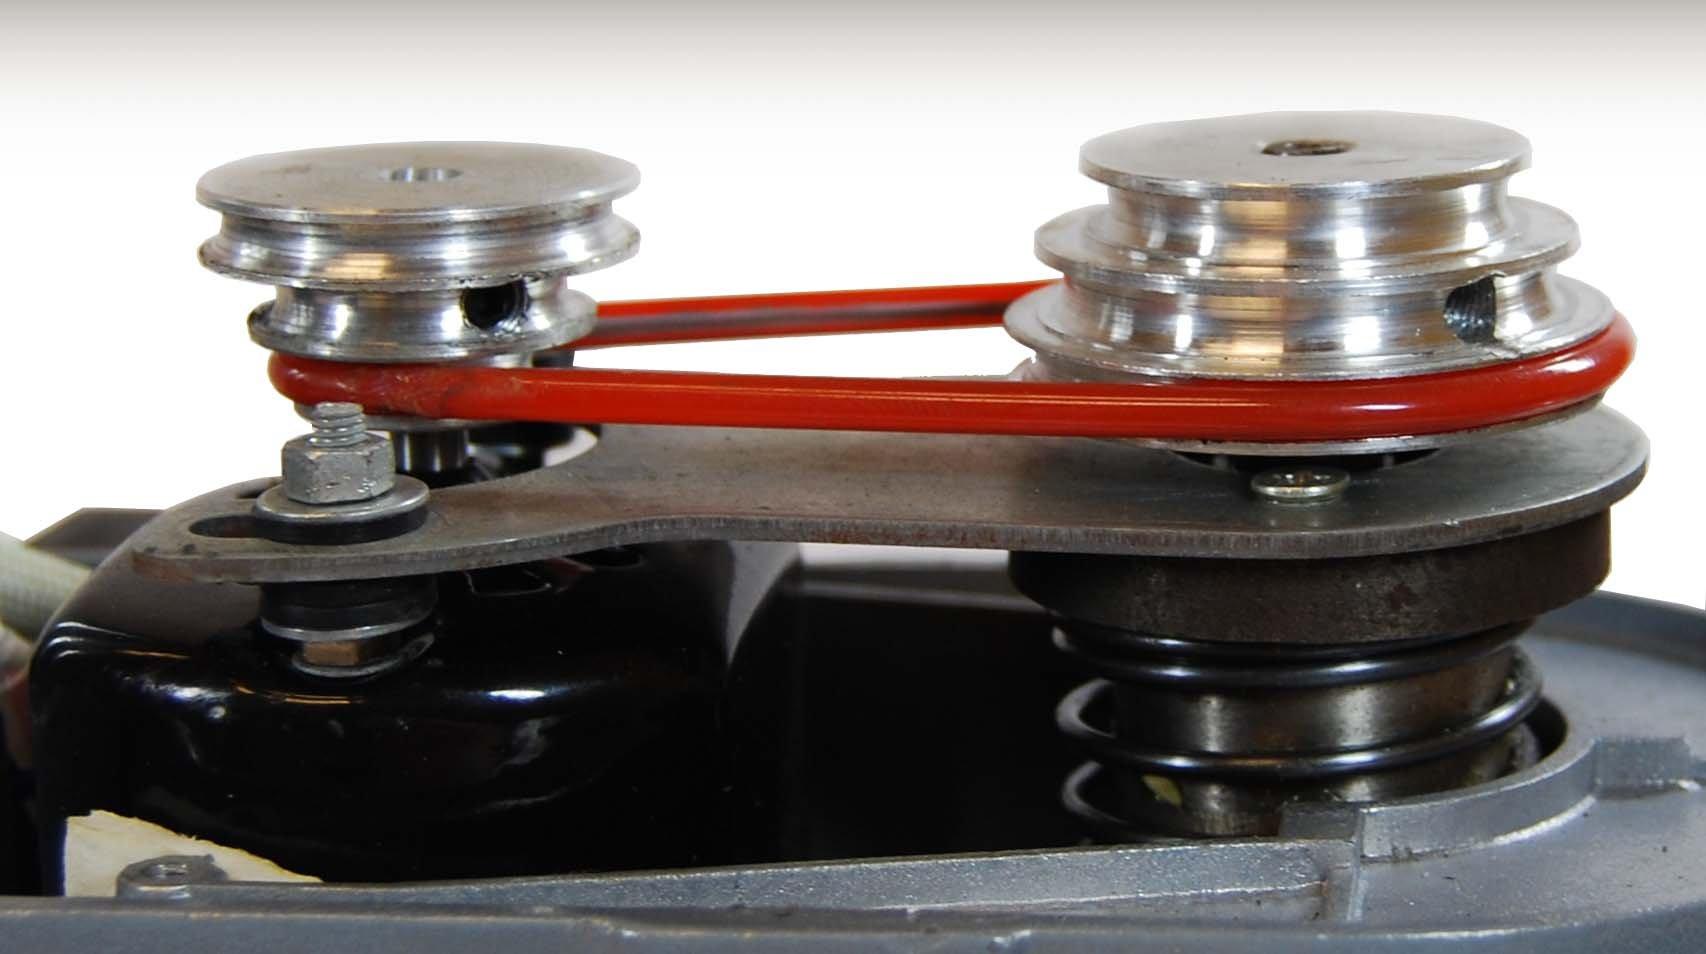 SE 3-Speed Mini Drill Press Bench by SE (Image #4)